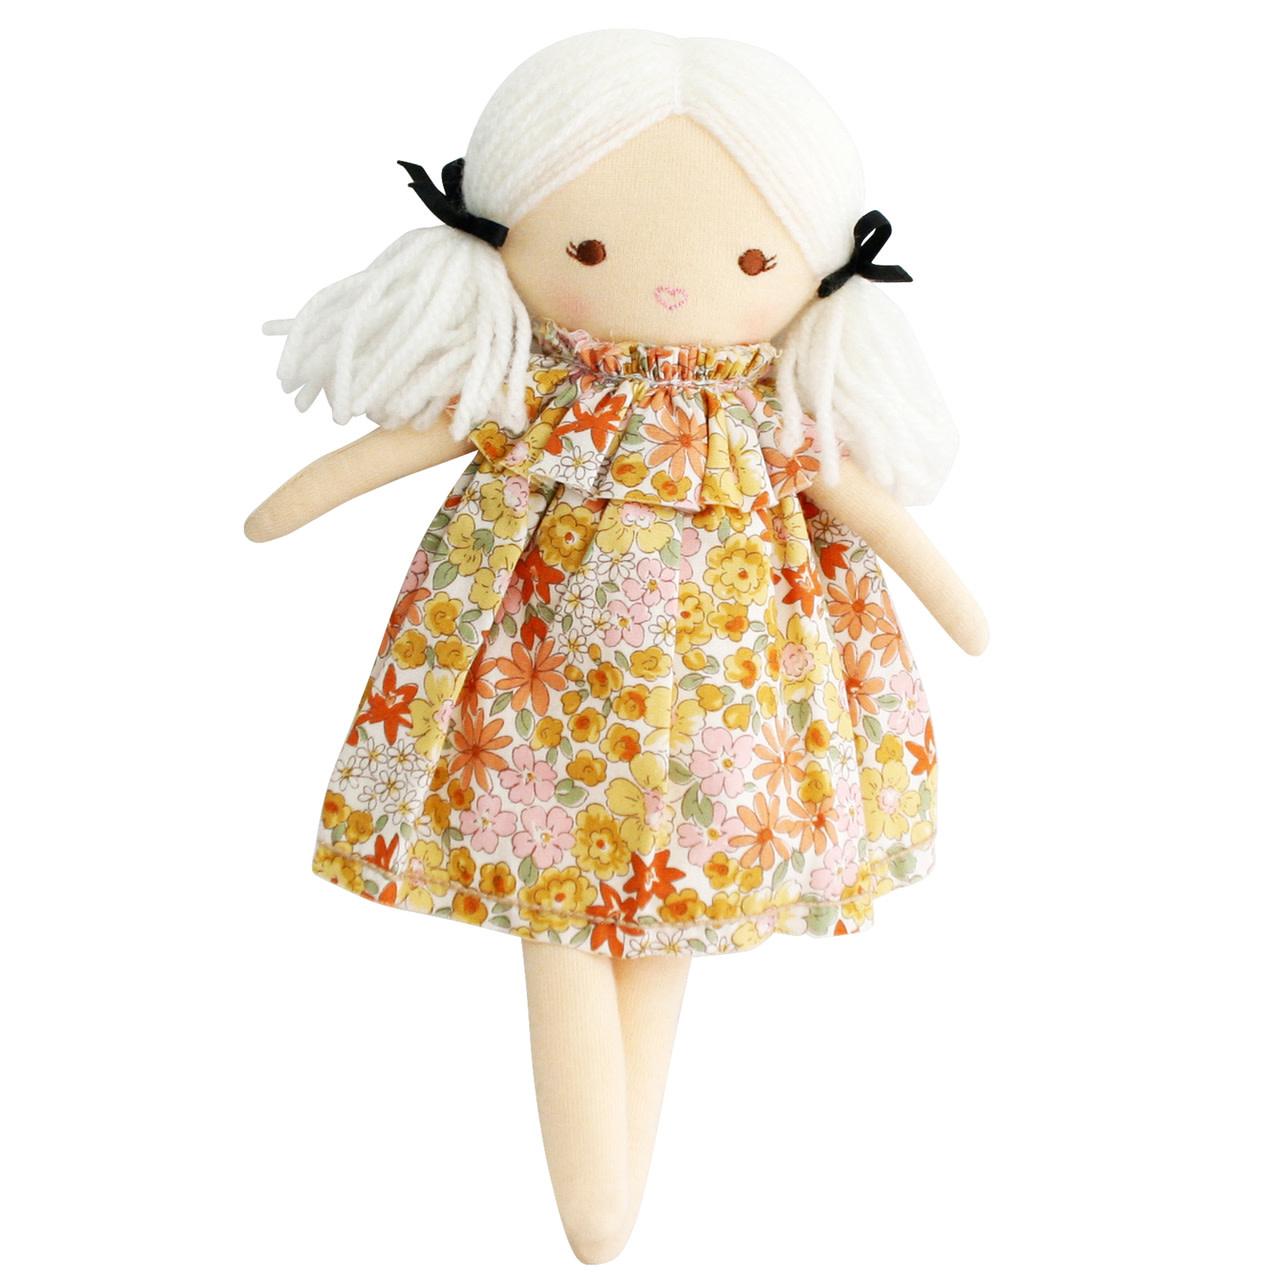 Alimrose Mini Matilda - Asleep Awake Sweet Marigold